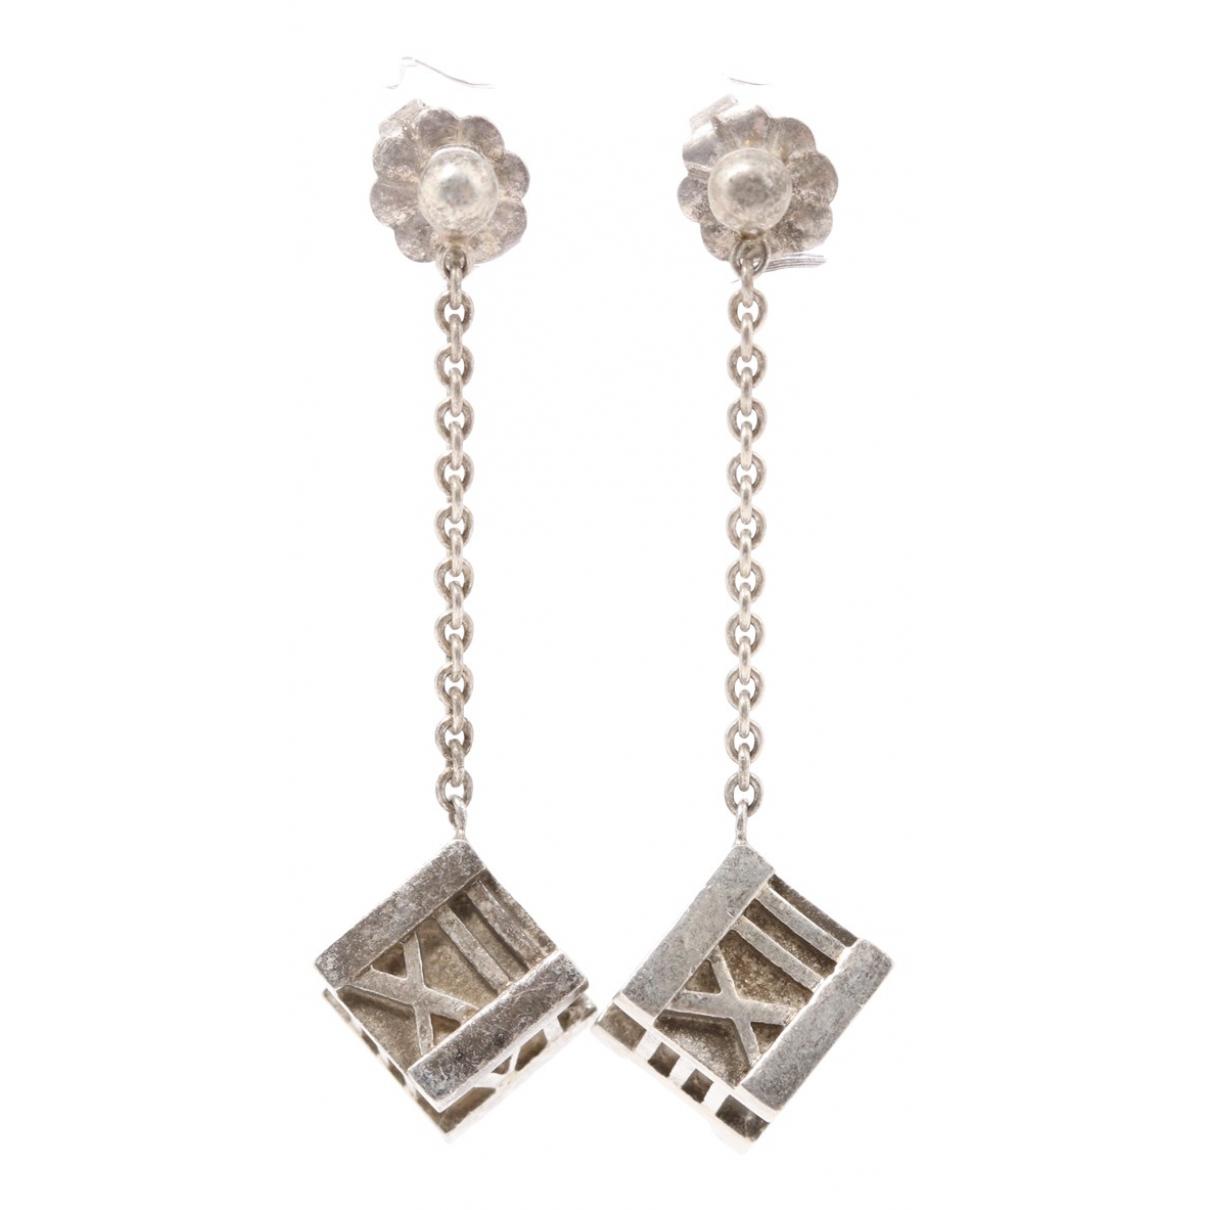 Tiffany & Co Atlas OhrRing in  Silber Silber